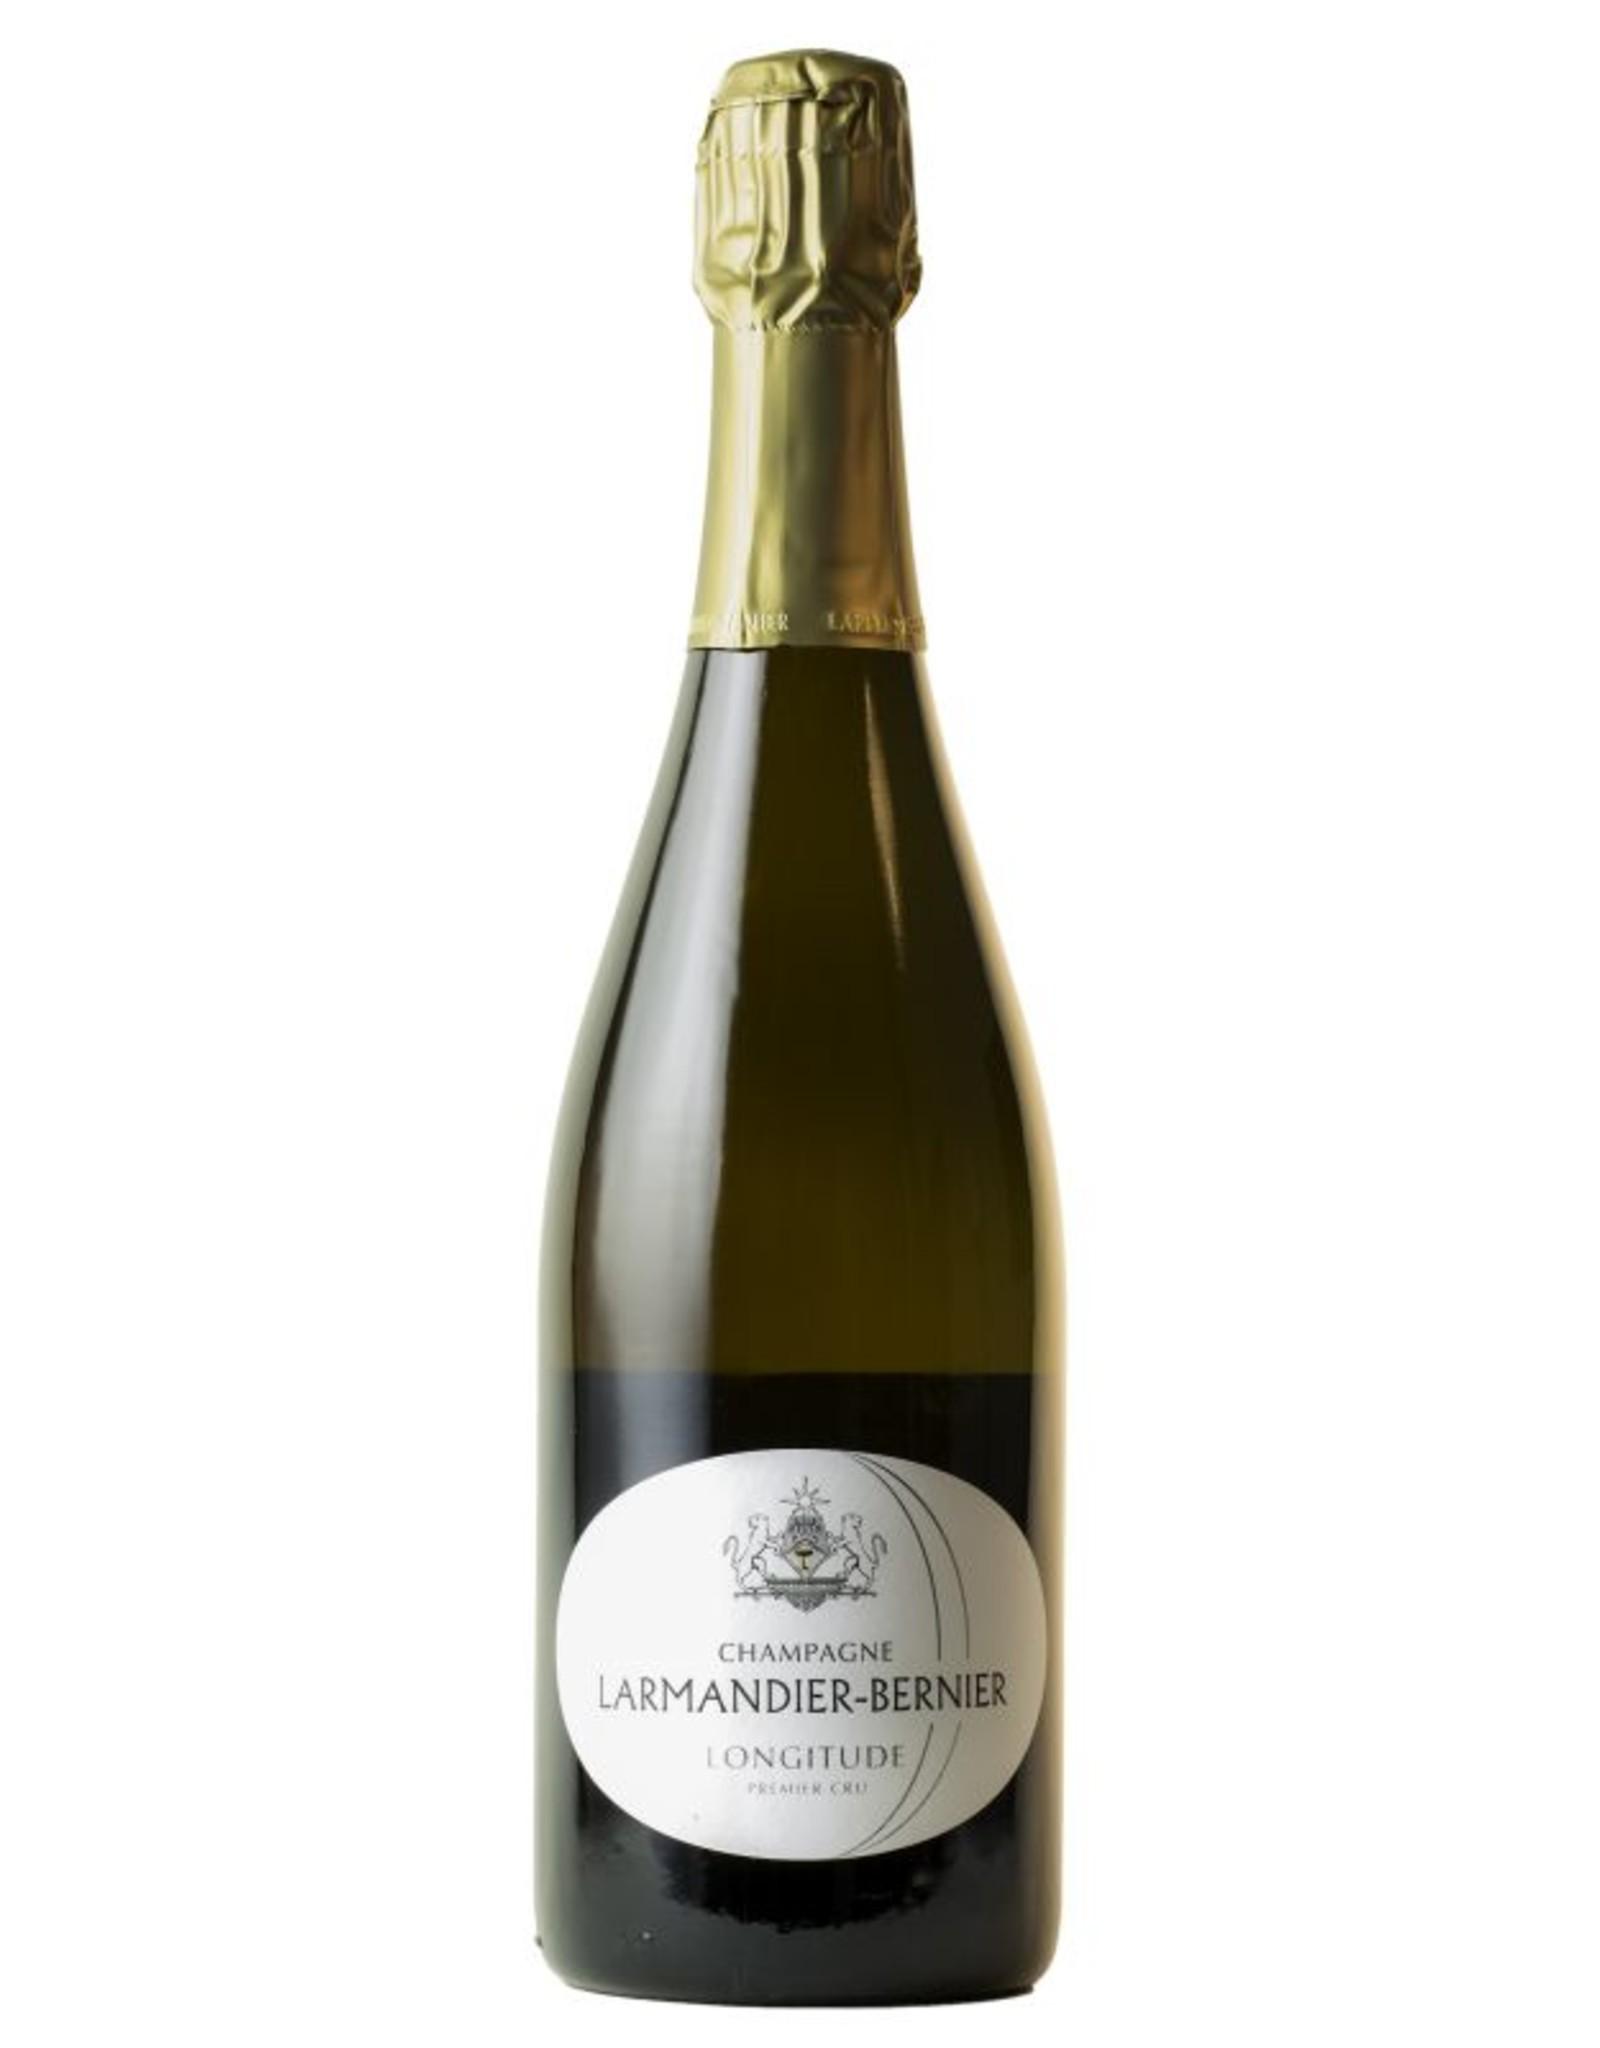 Proef Champagne Larmandier-Bernier Blanc de Blancs Longitude 1er Cru